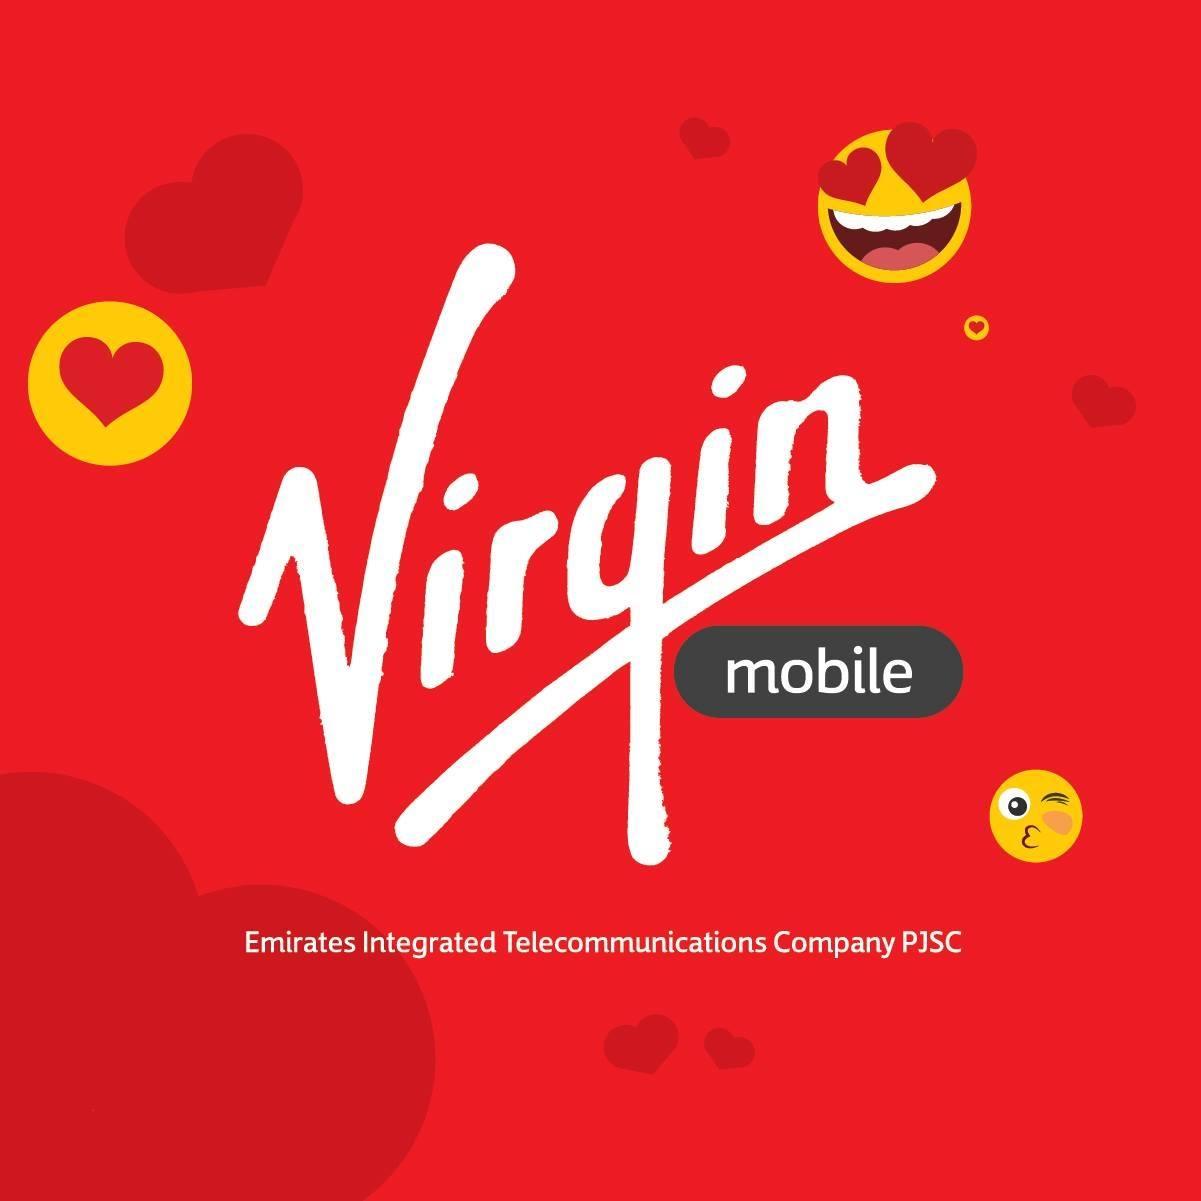 Virgin Mobile UAE coupon code